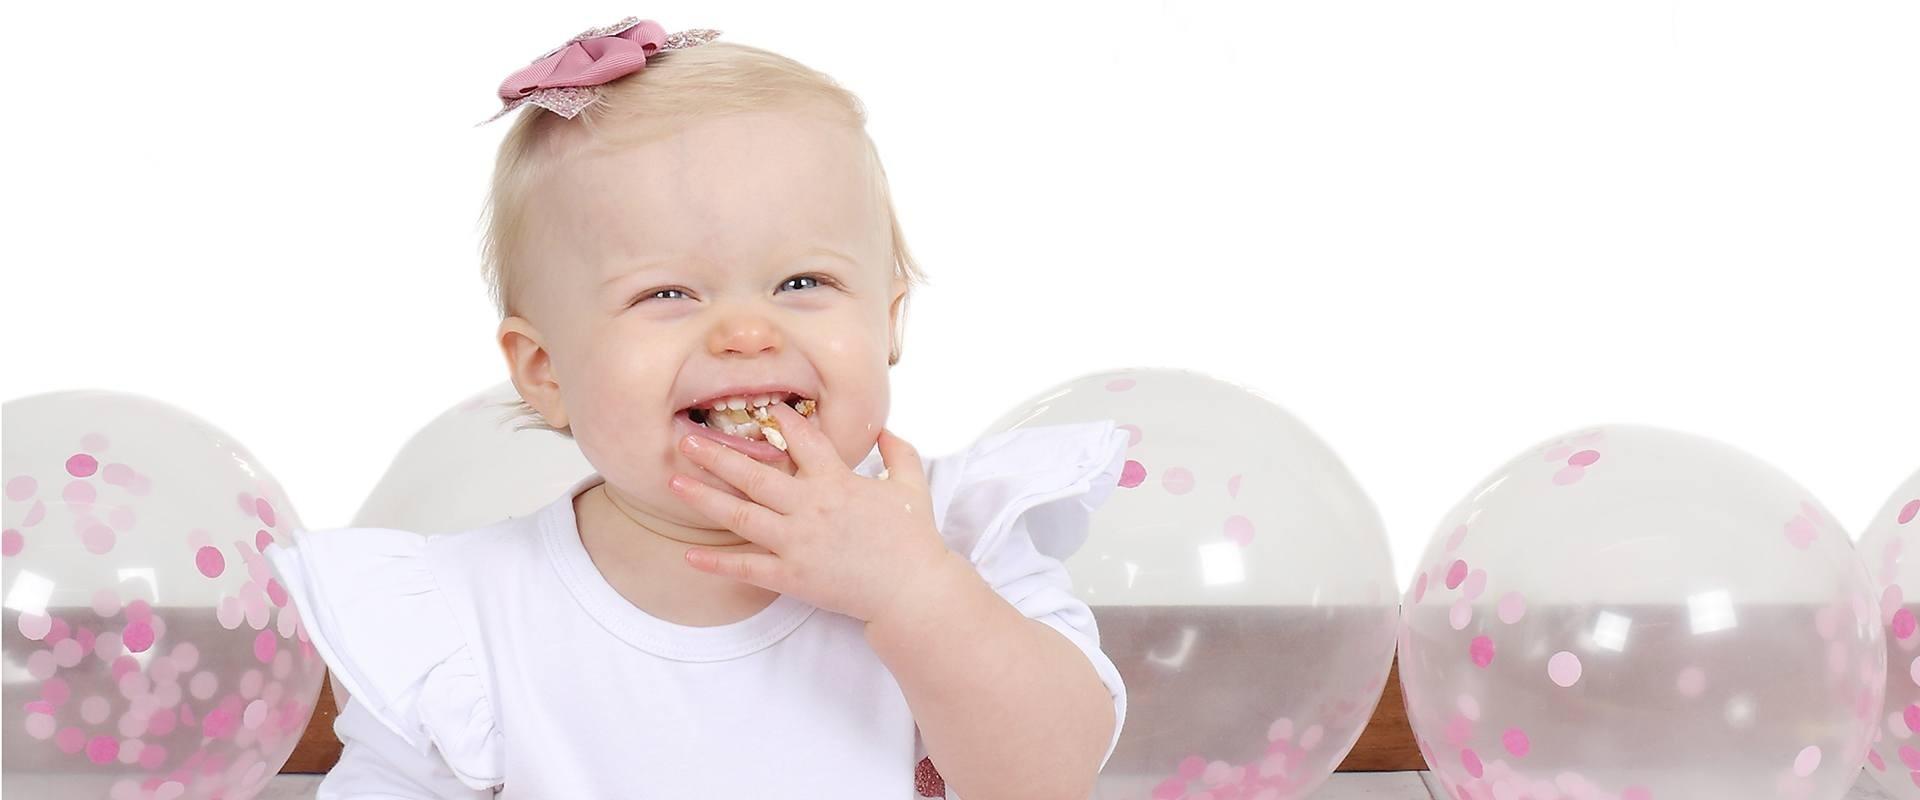 Photographer, Bromsgrove, Worcestershire - Newborn, Children, Cake Smash, Family & Wedding Photography -